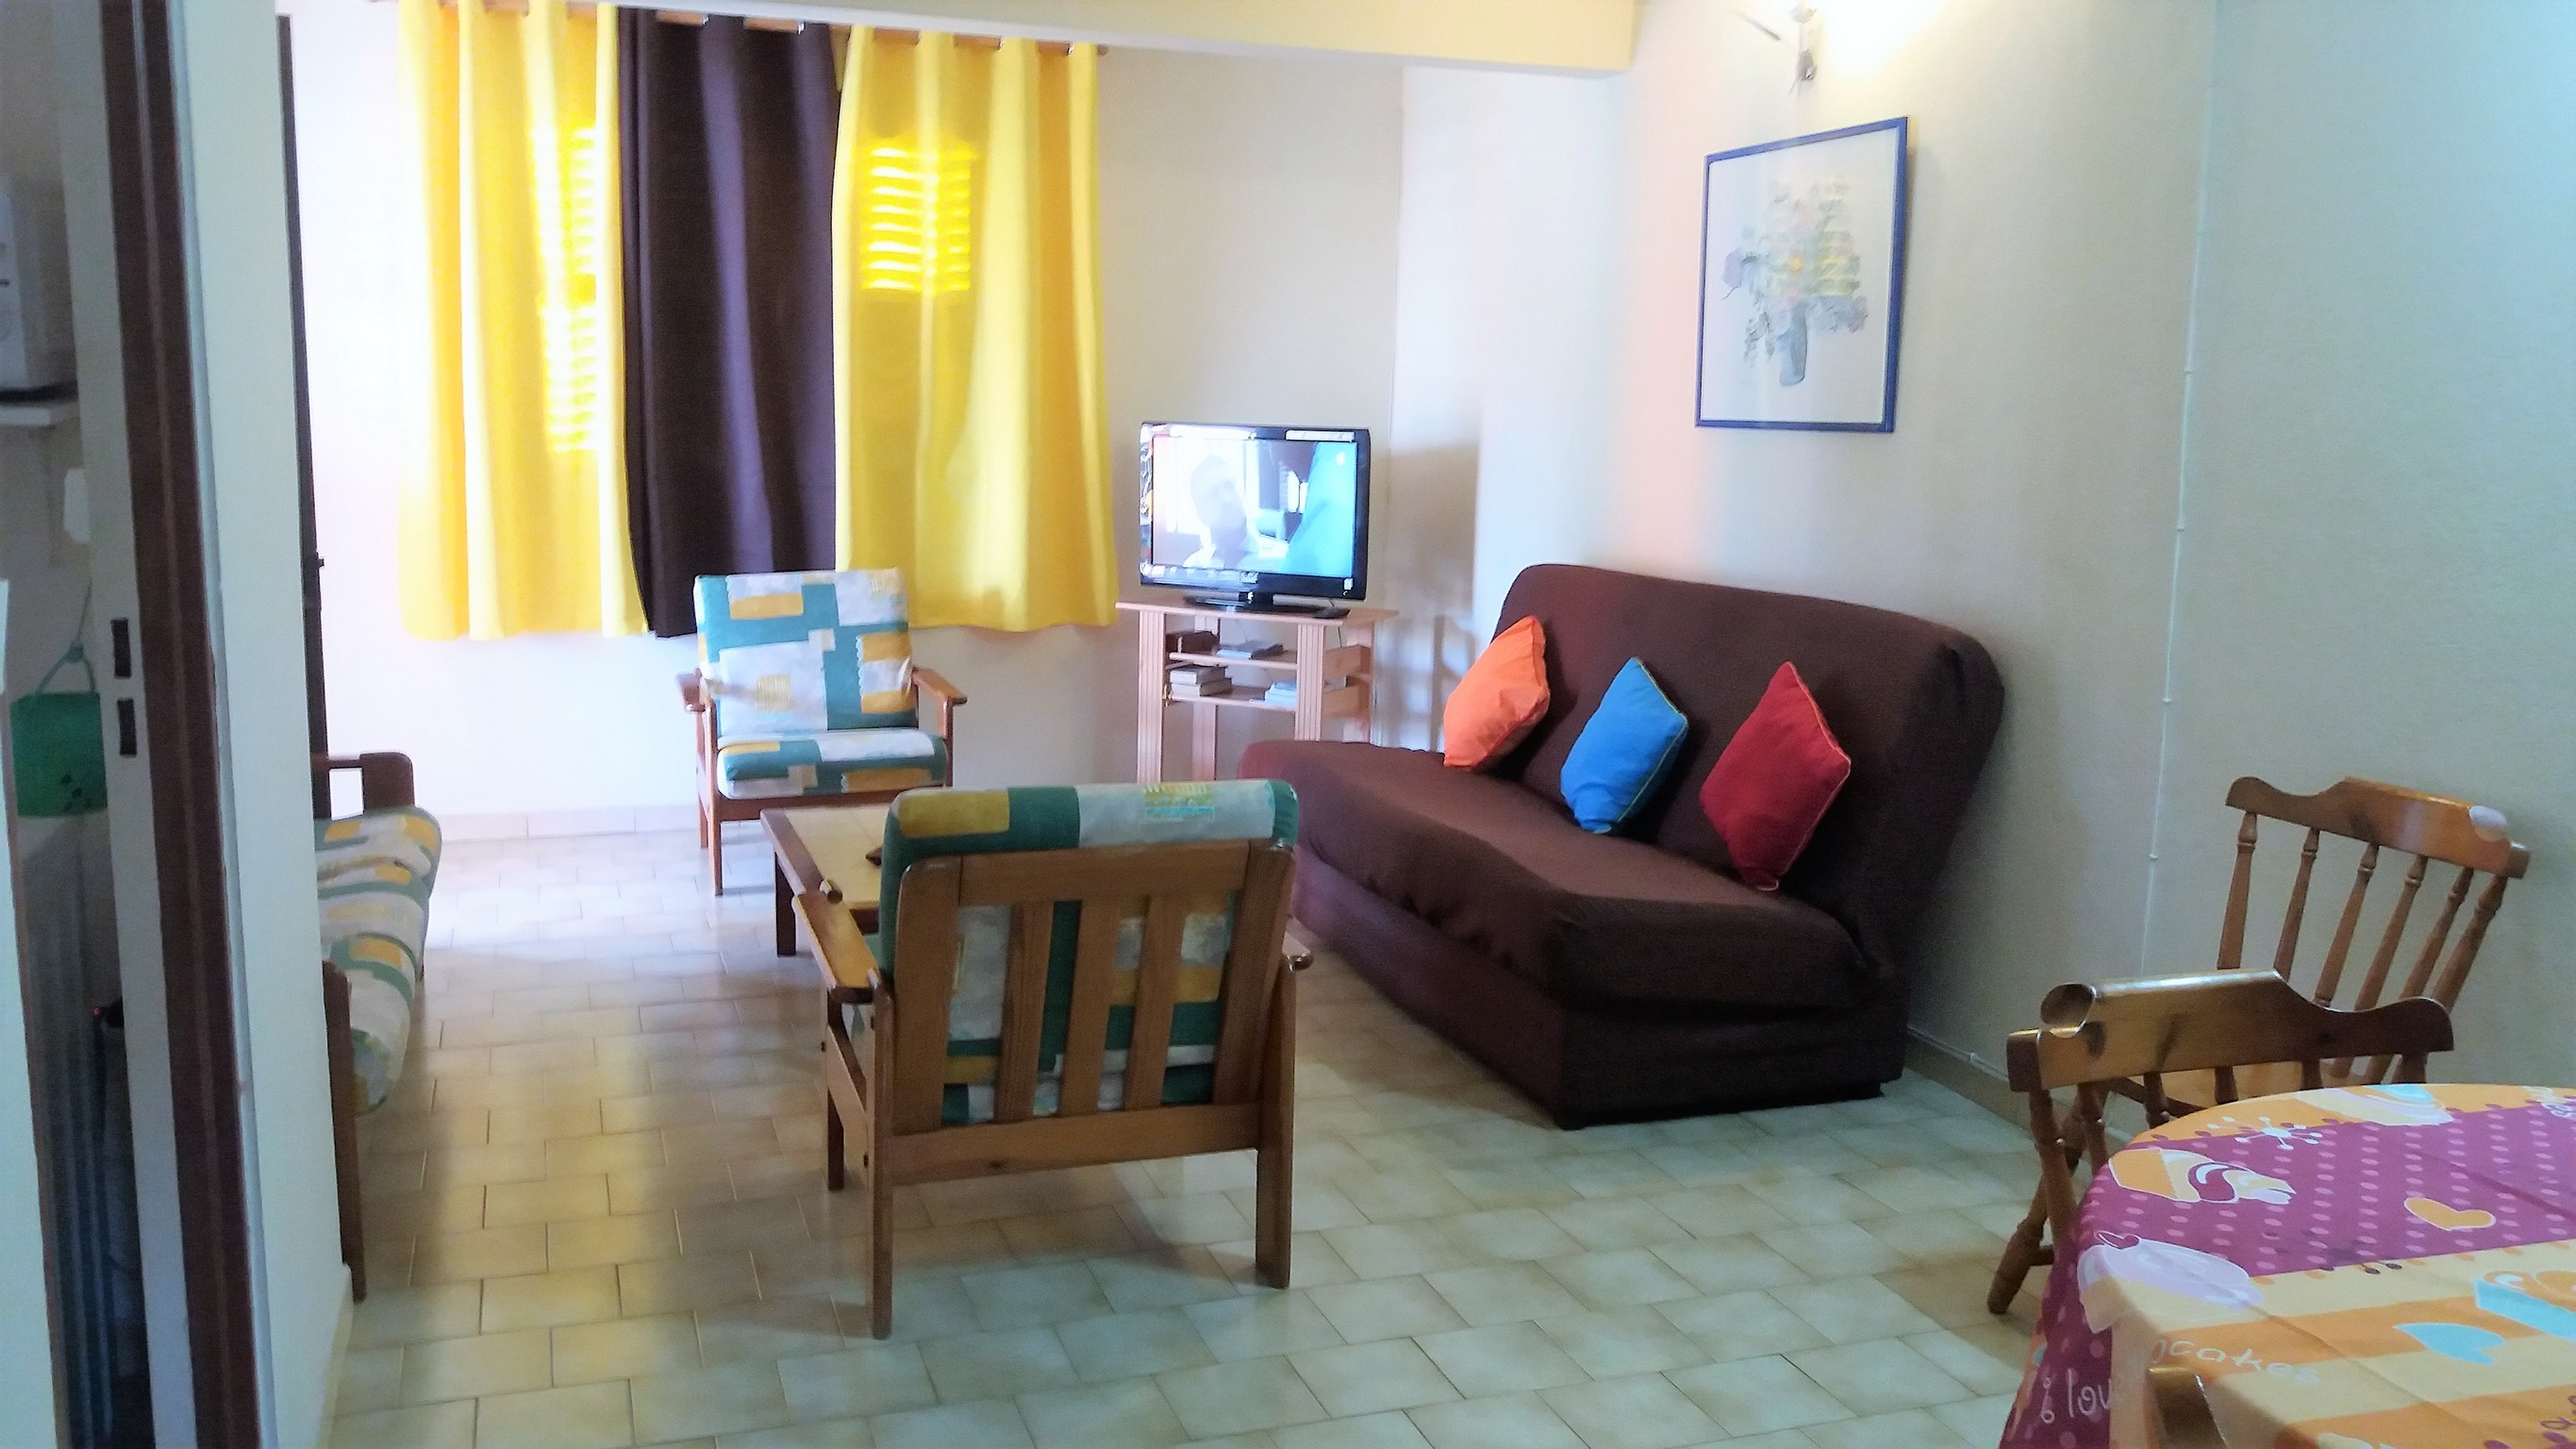 ferienwohnung sainte luce 4 personen martinique le marin 716785. Black Bedroom Furniture Sets. Home Design Ideas